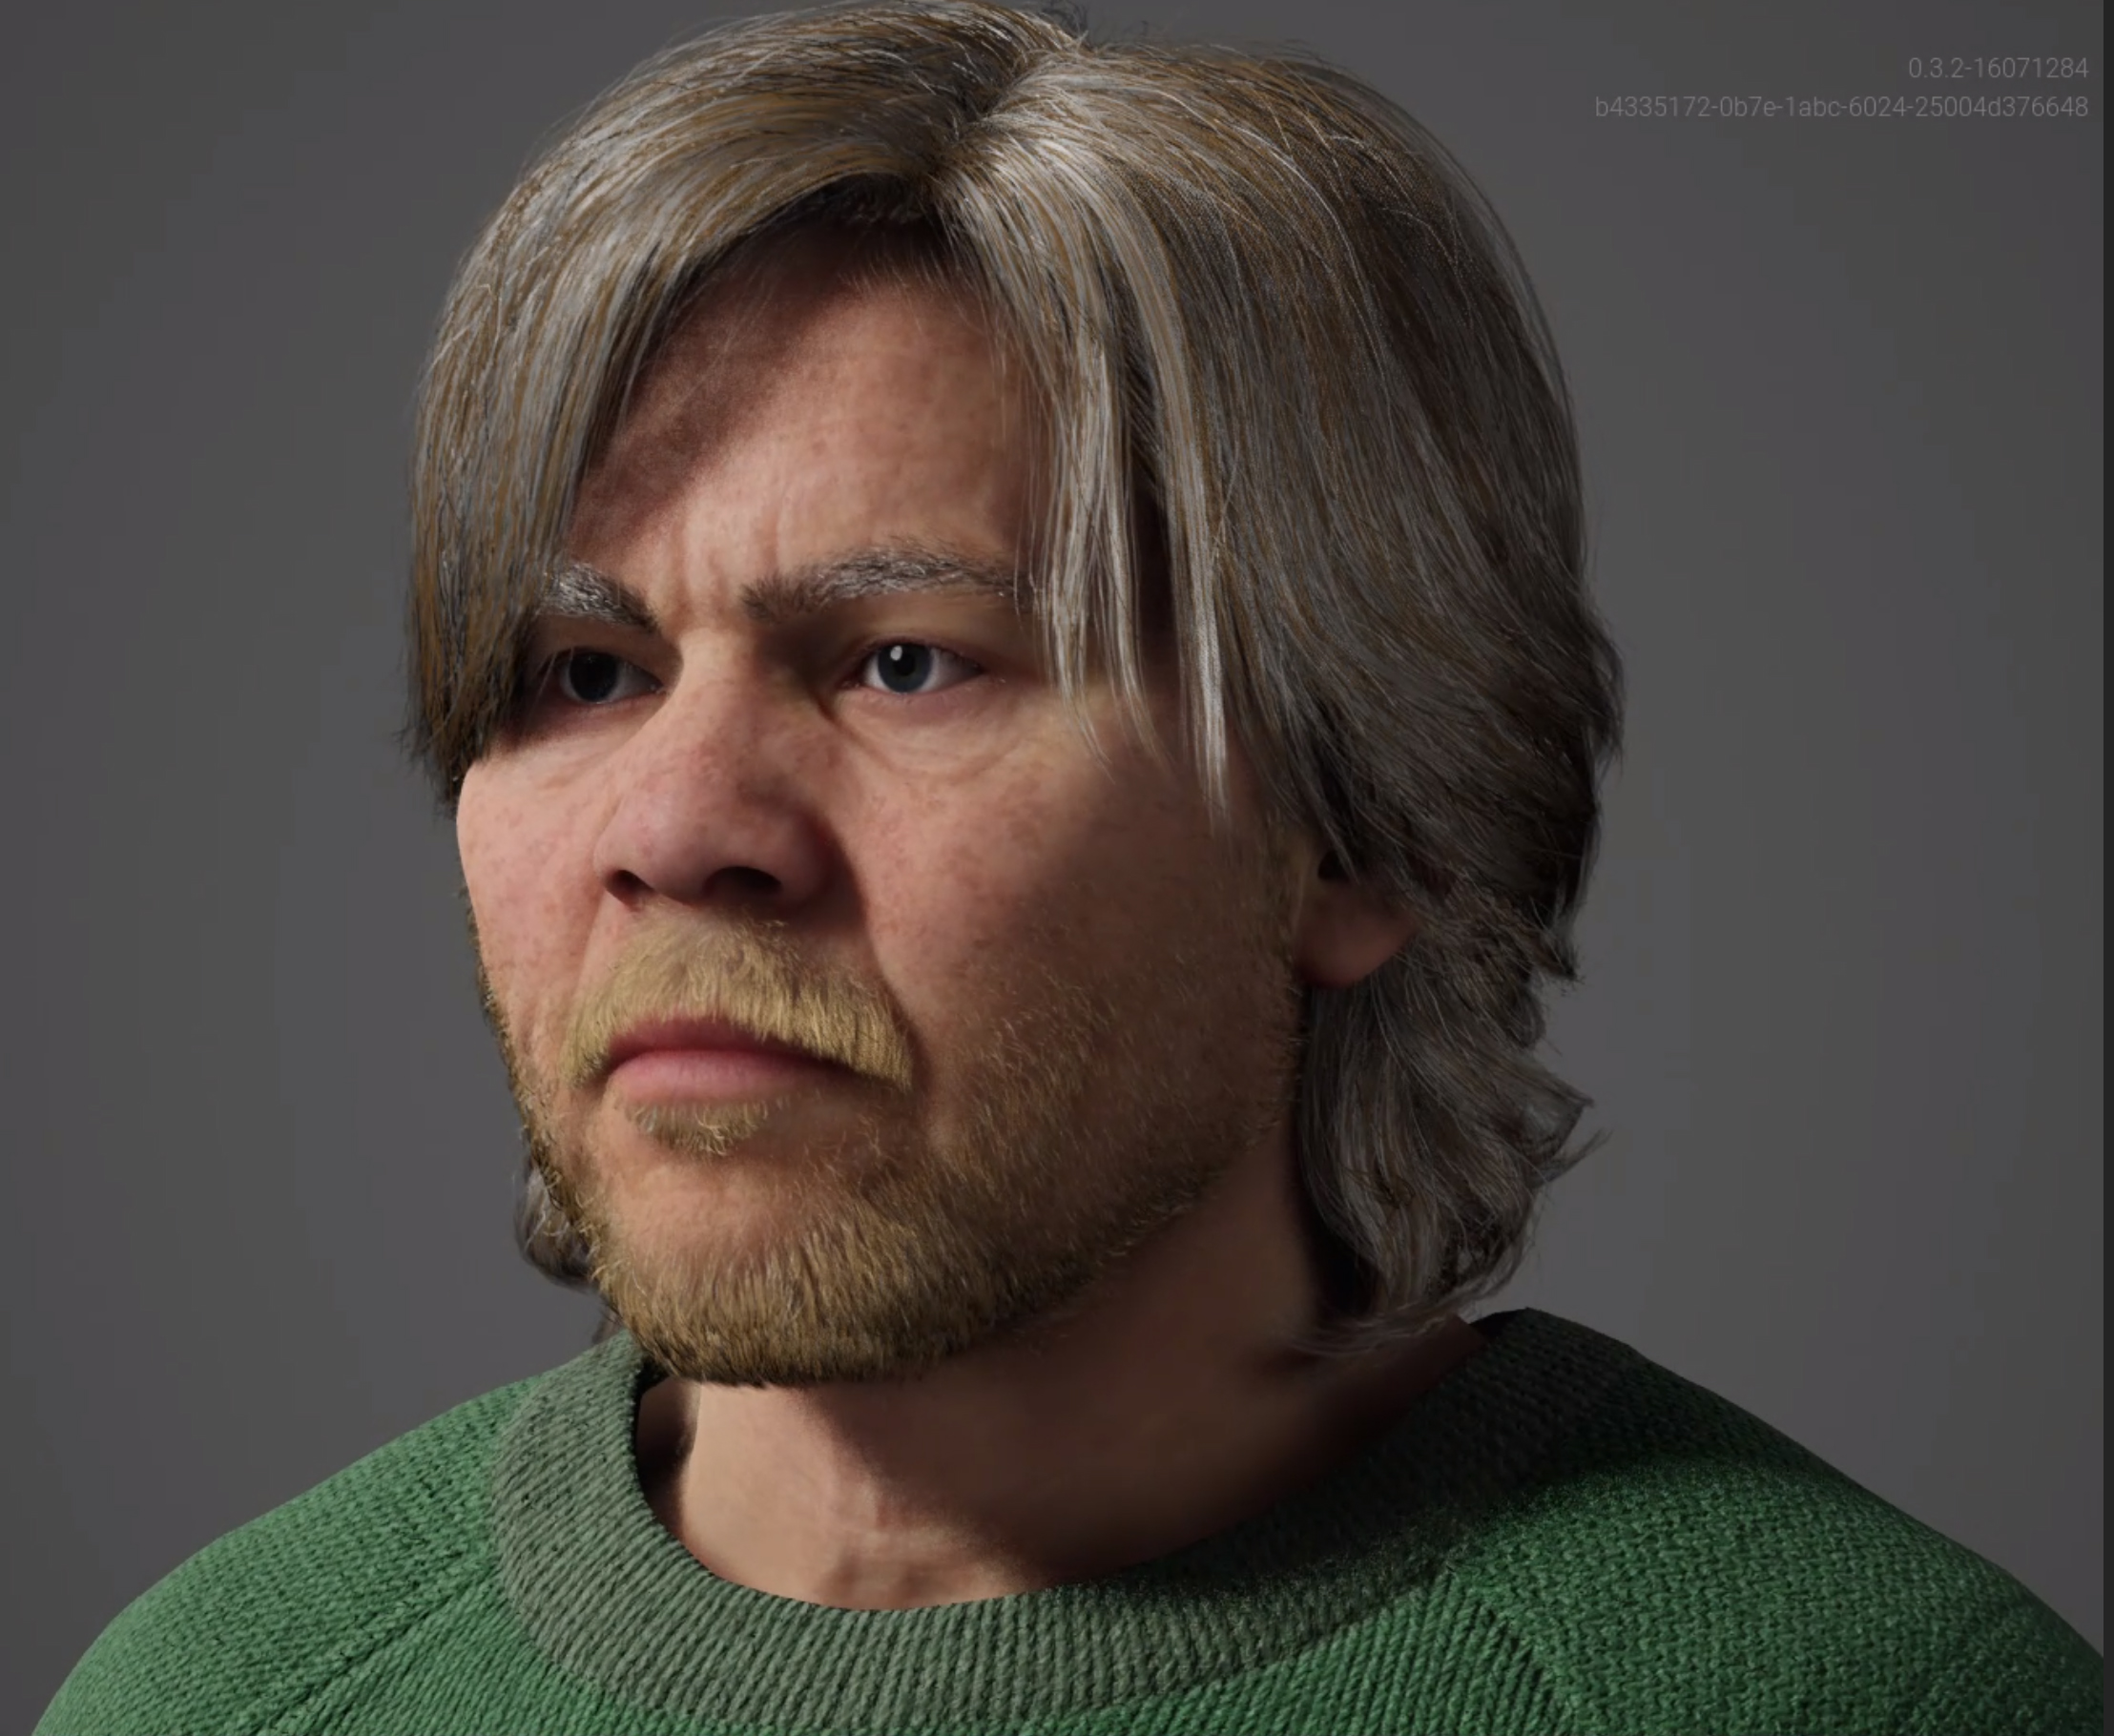 This is Gardener a MetaHuman created with the Unreal Engine Metahuman Creator